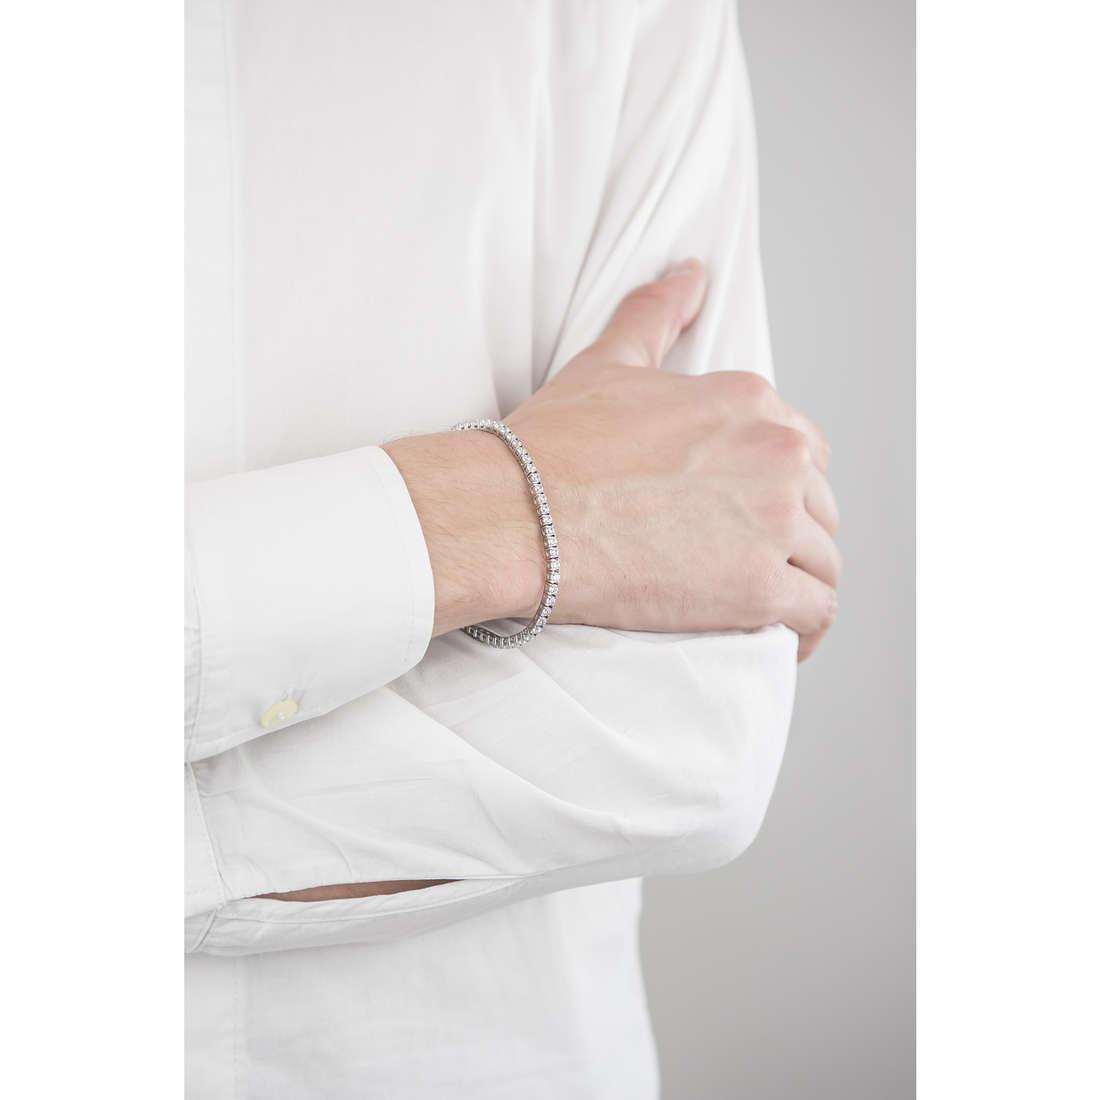 Luca Barra bracciali uomo LBBA737 indosso